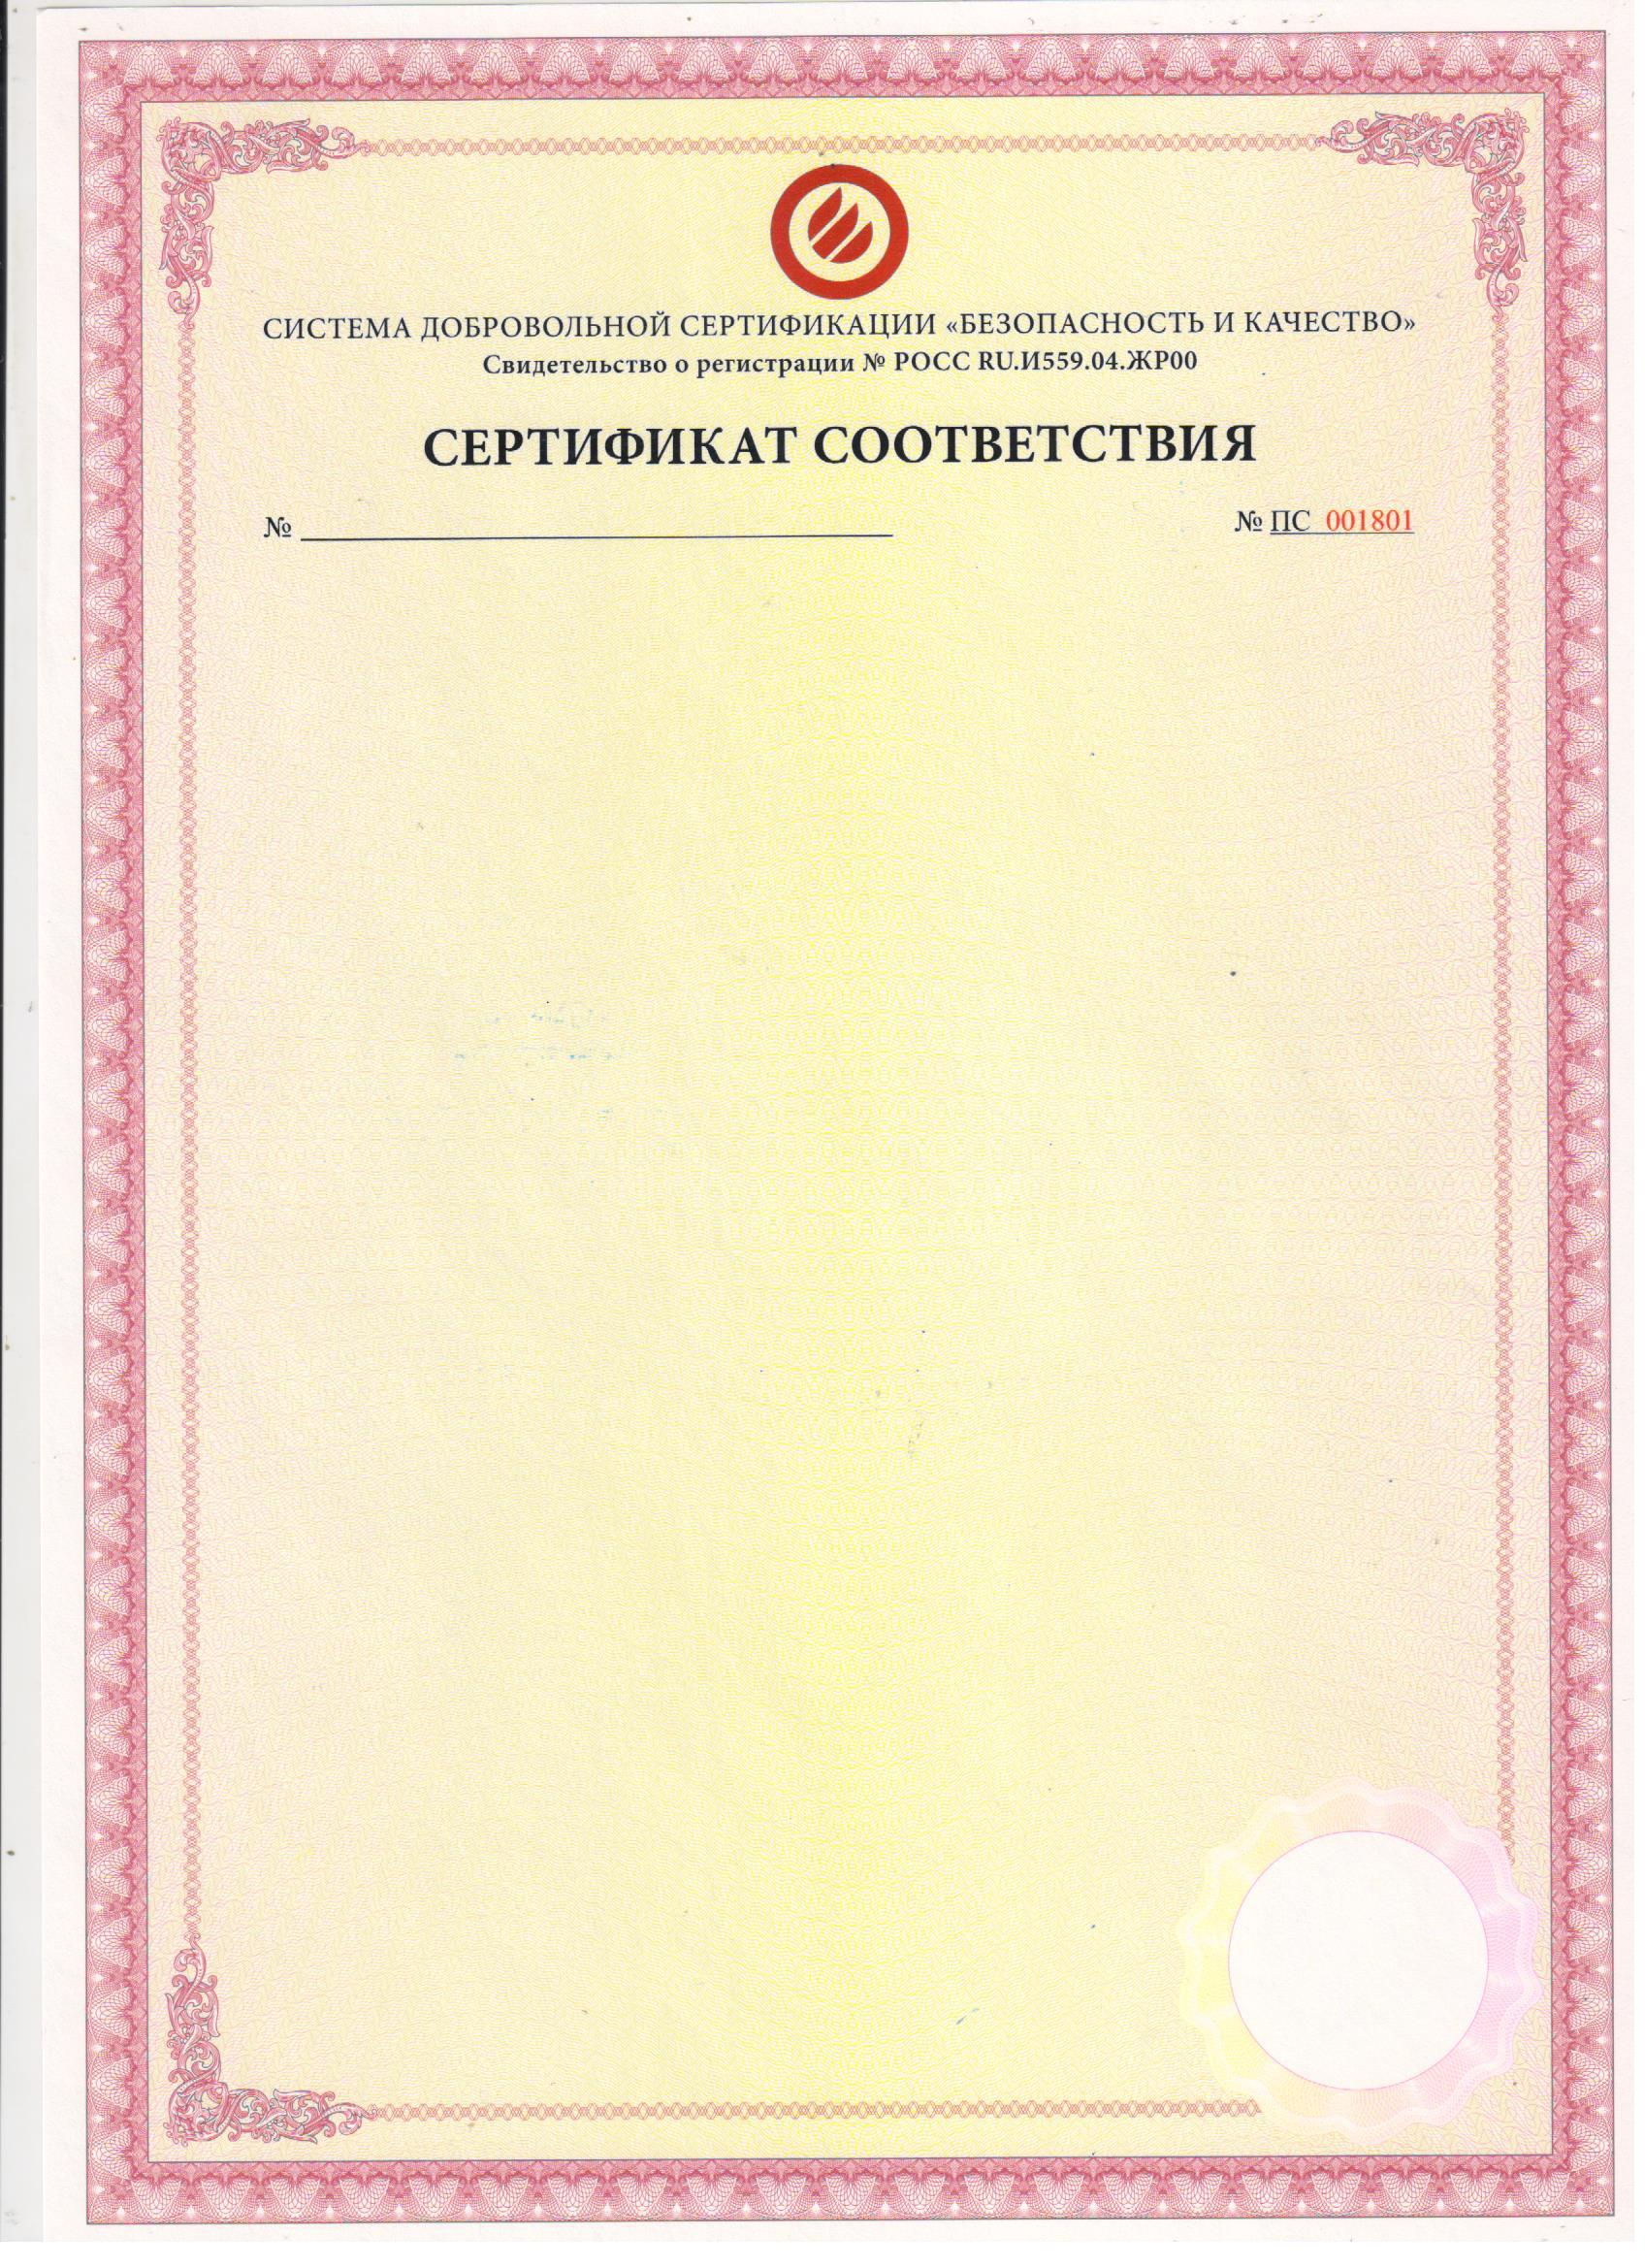 Картинки сертификаты соответствия